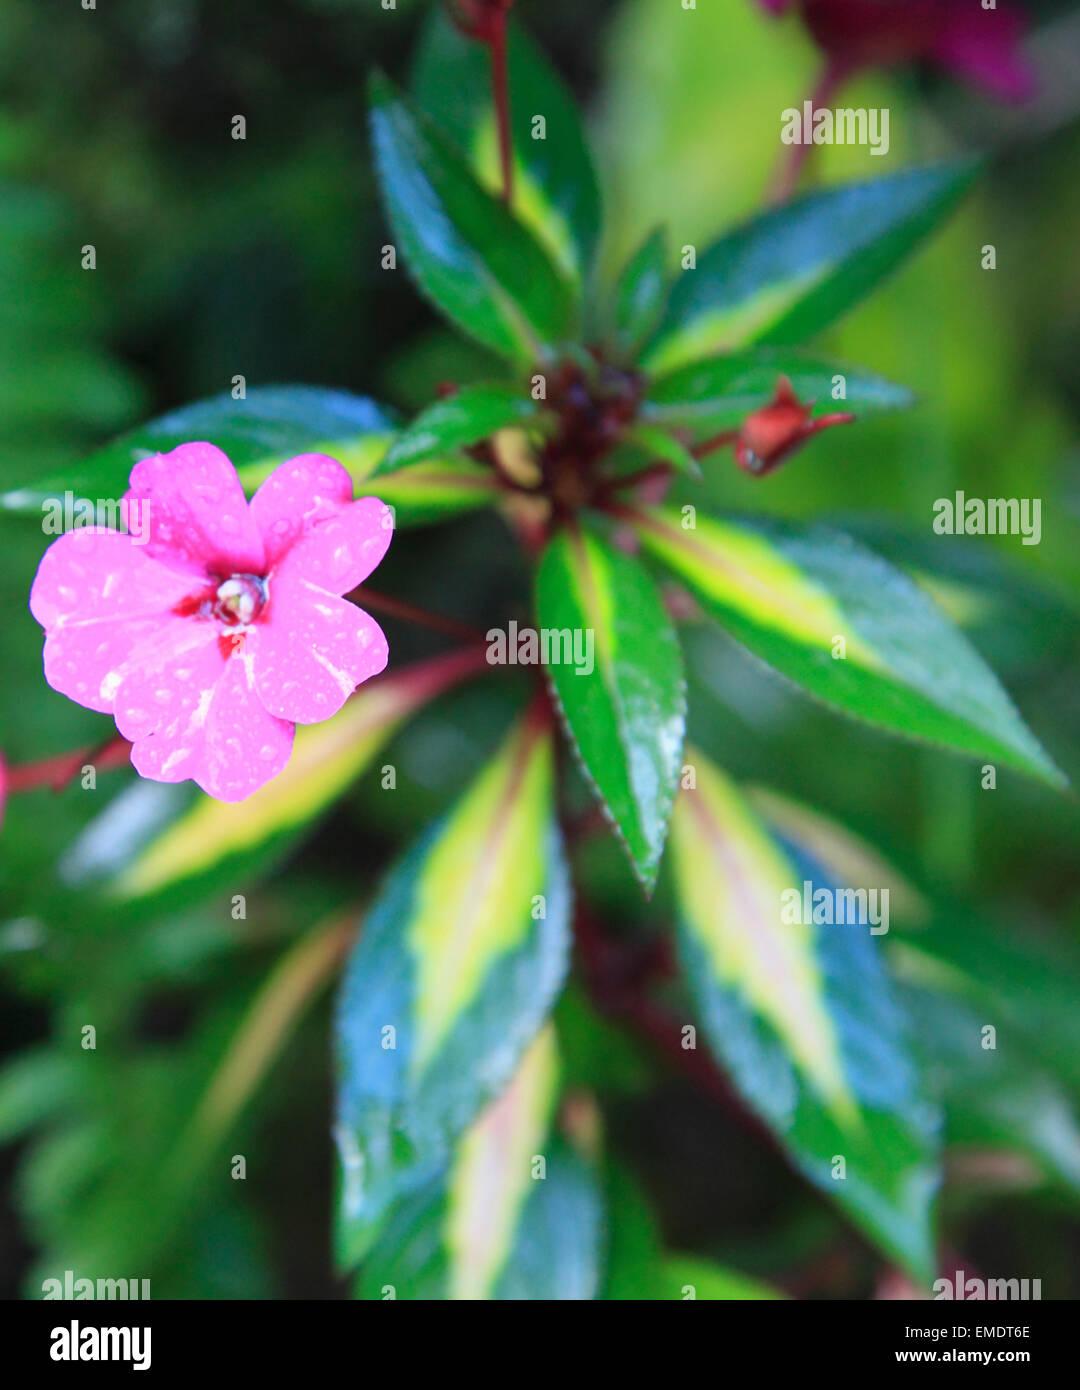 Hawaii, Big Island, Hilo, garden, flower, - Stock Image